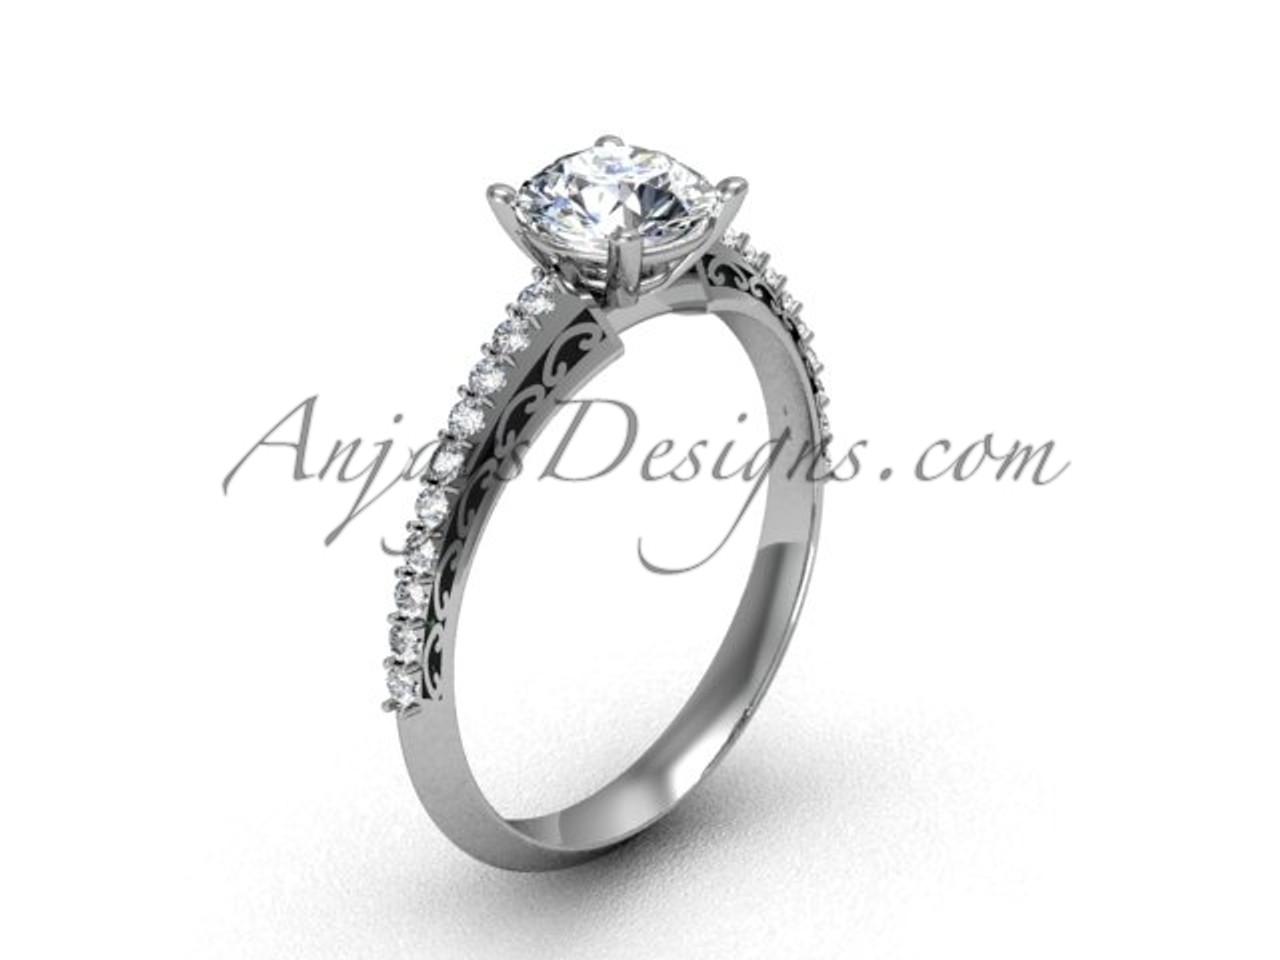 Womens Wedding Rings.Women S Platinum Engagement Rings Unique Vintage Wedding Ring Sgt626